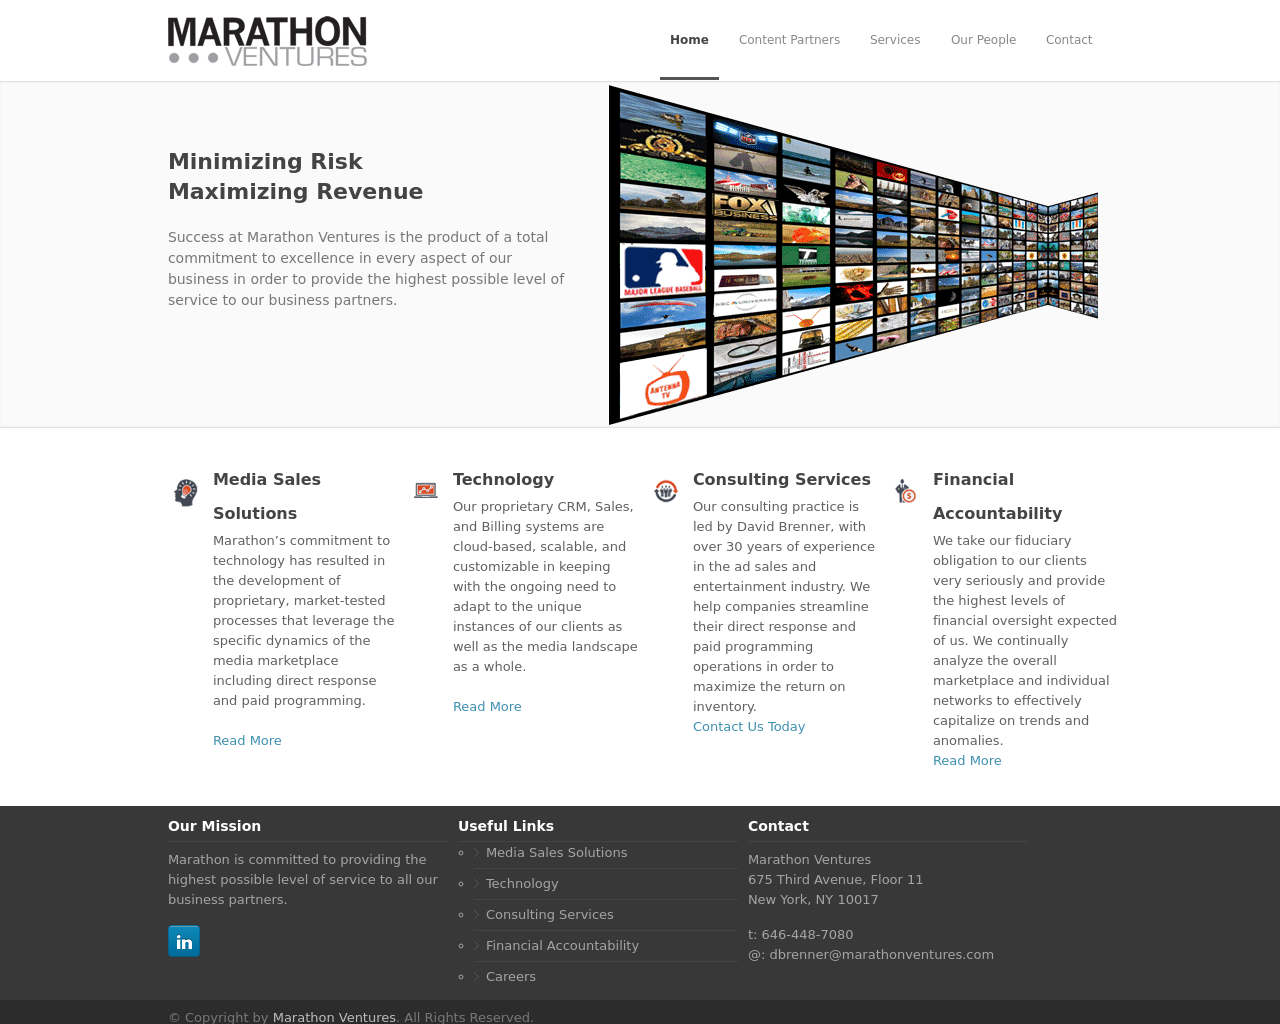 Marathon-Ventures-Media-Sales-Advertising-Reviews-Pricing